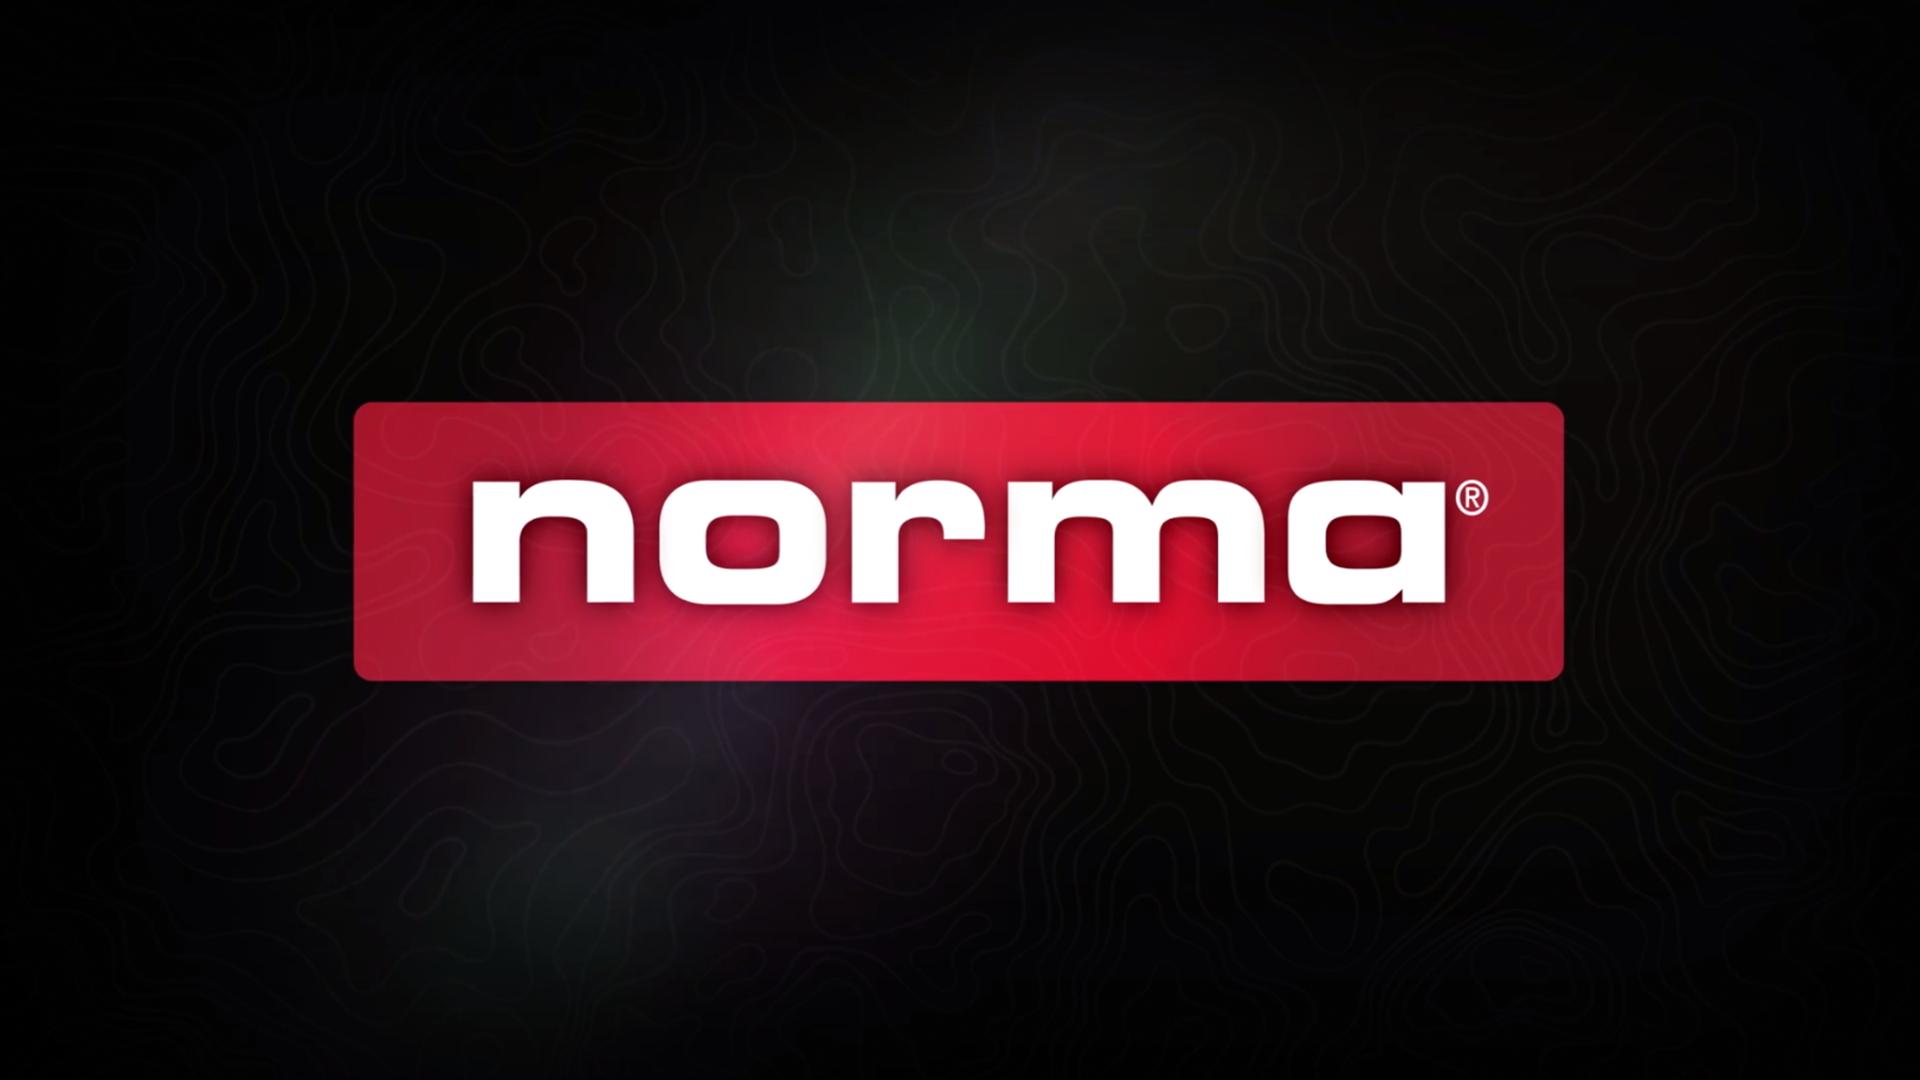 norma-vid-thumb